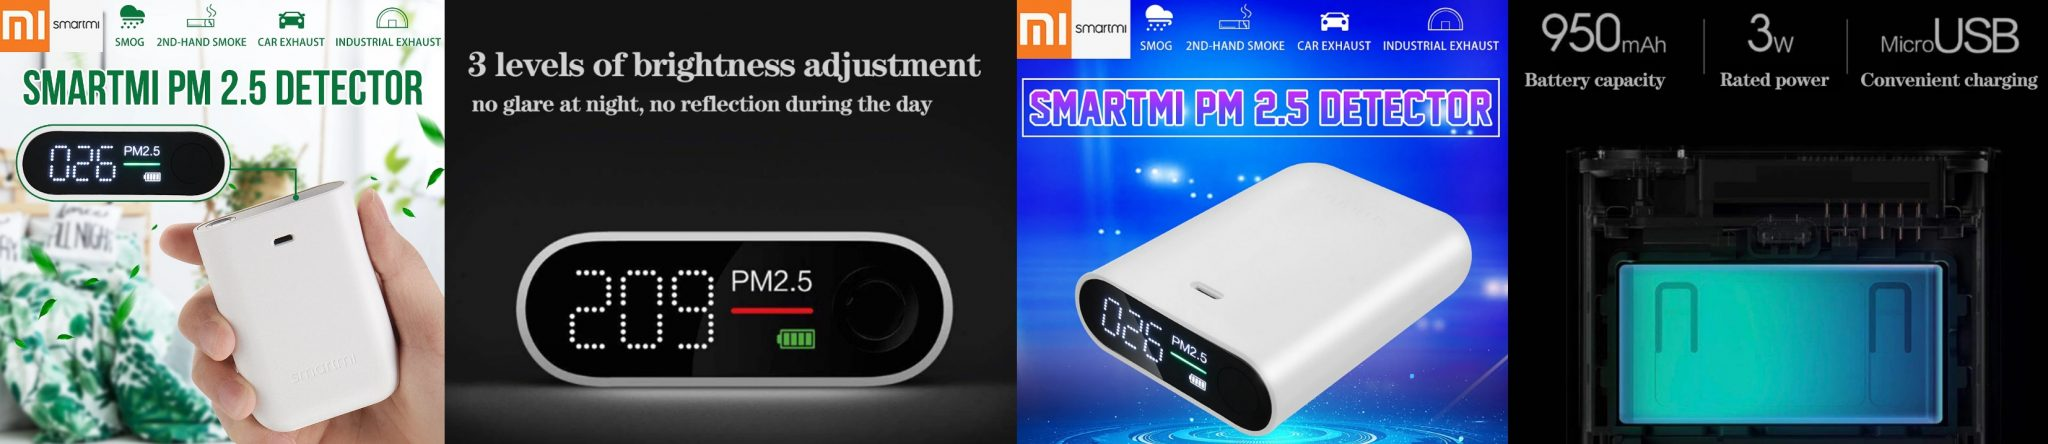 Xiaomi Smartmi PM detektor teszt 17